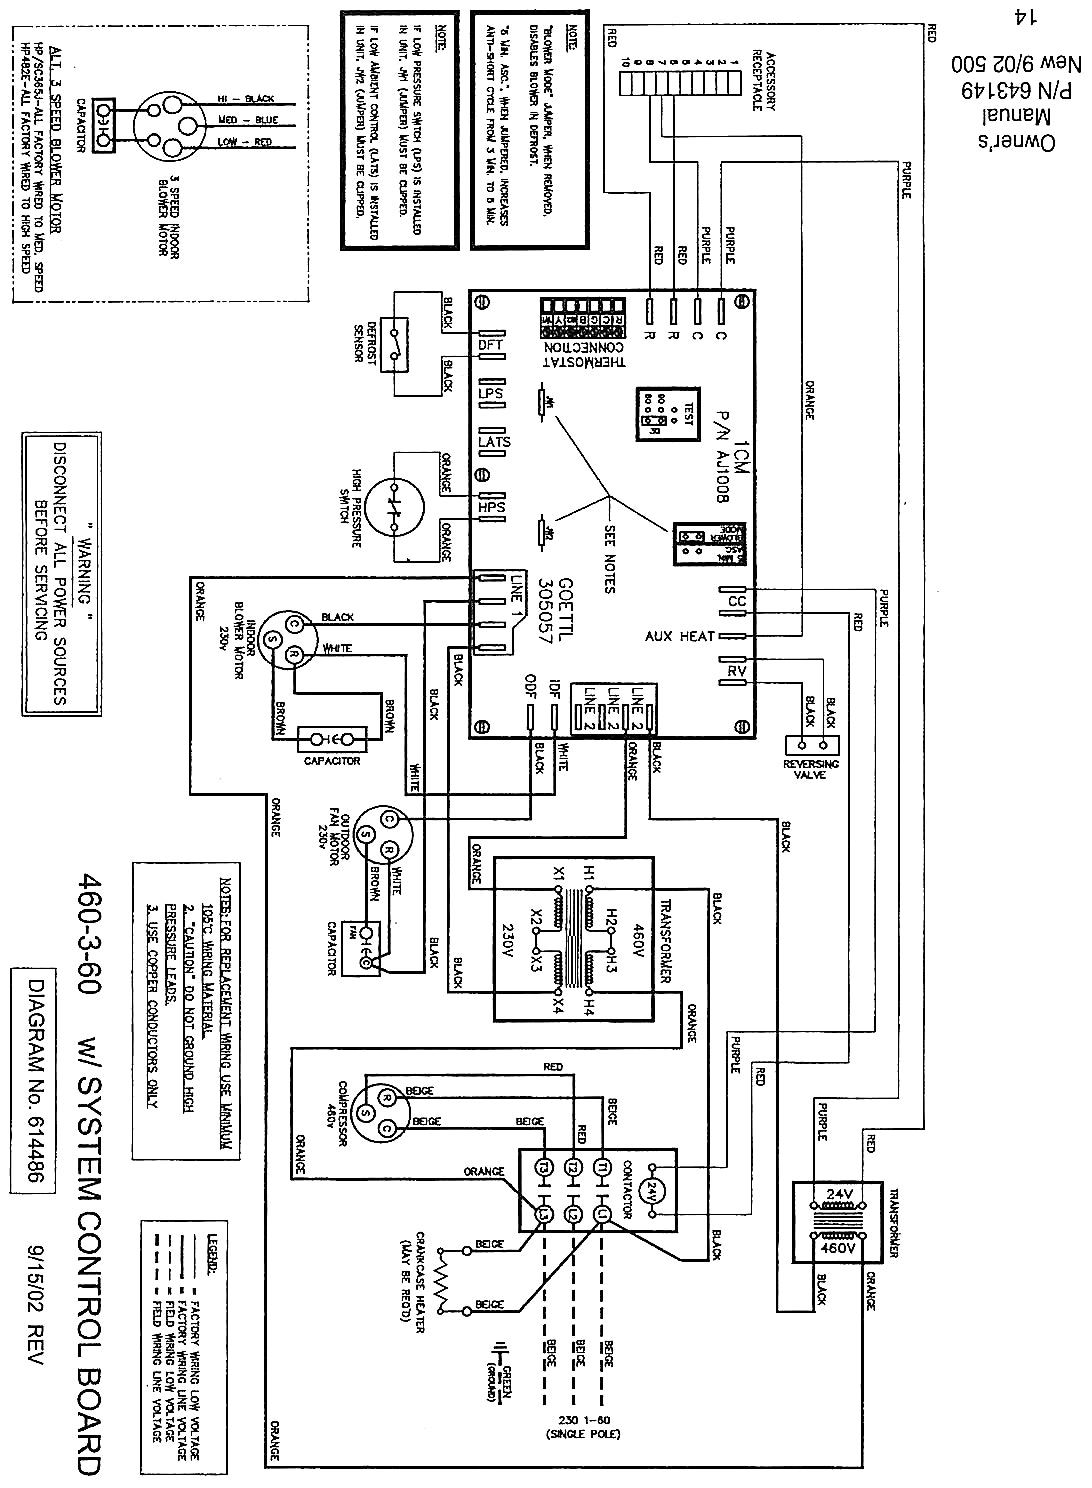 Heat Pump Wiring Diagram Goodman